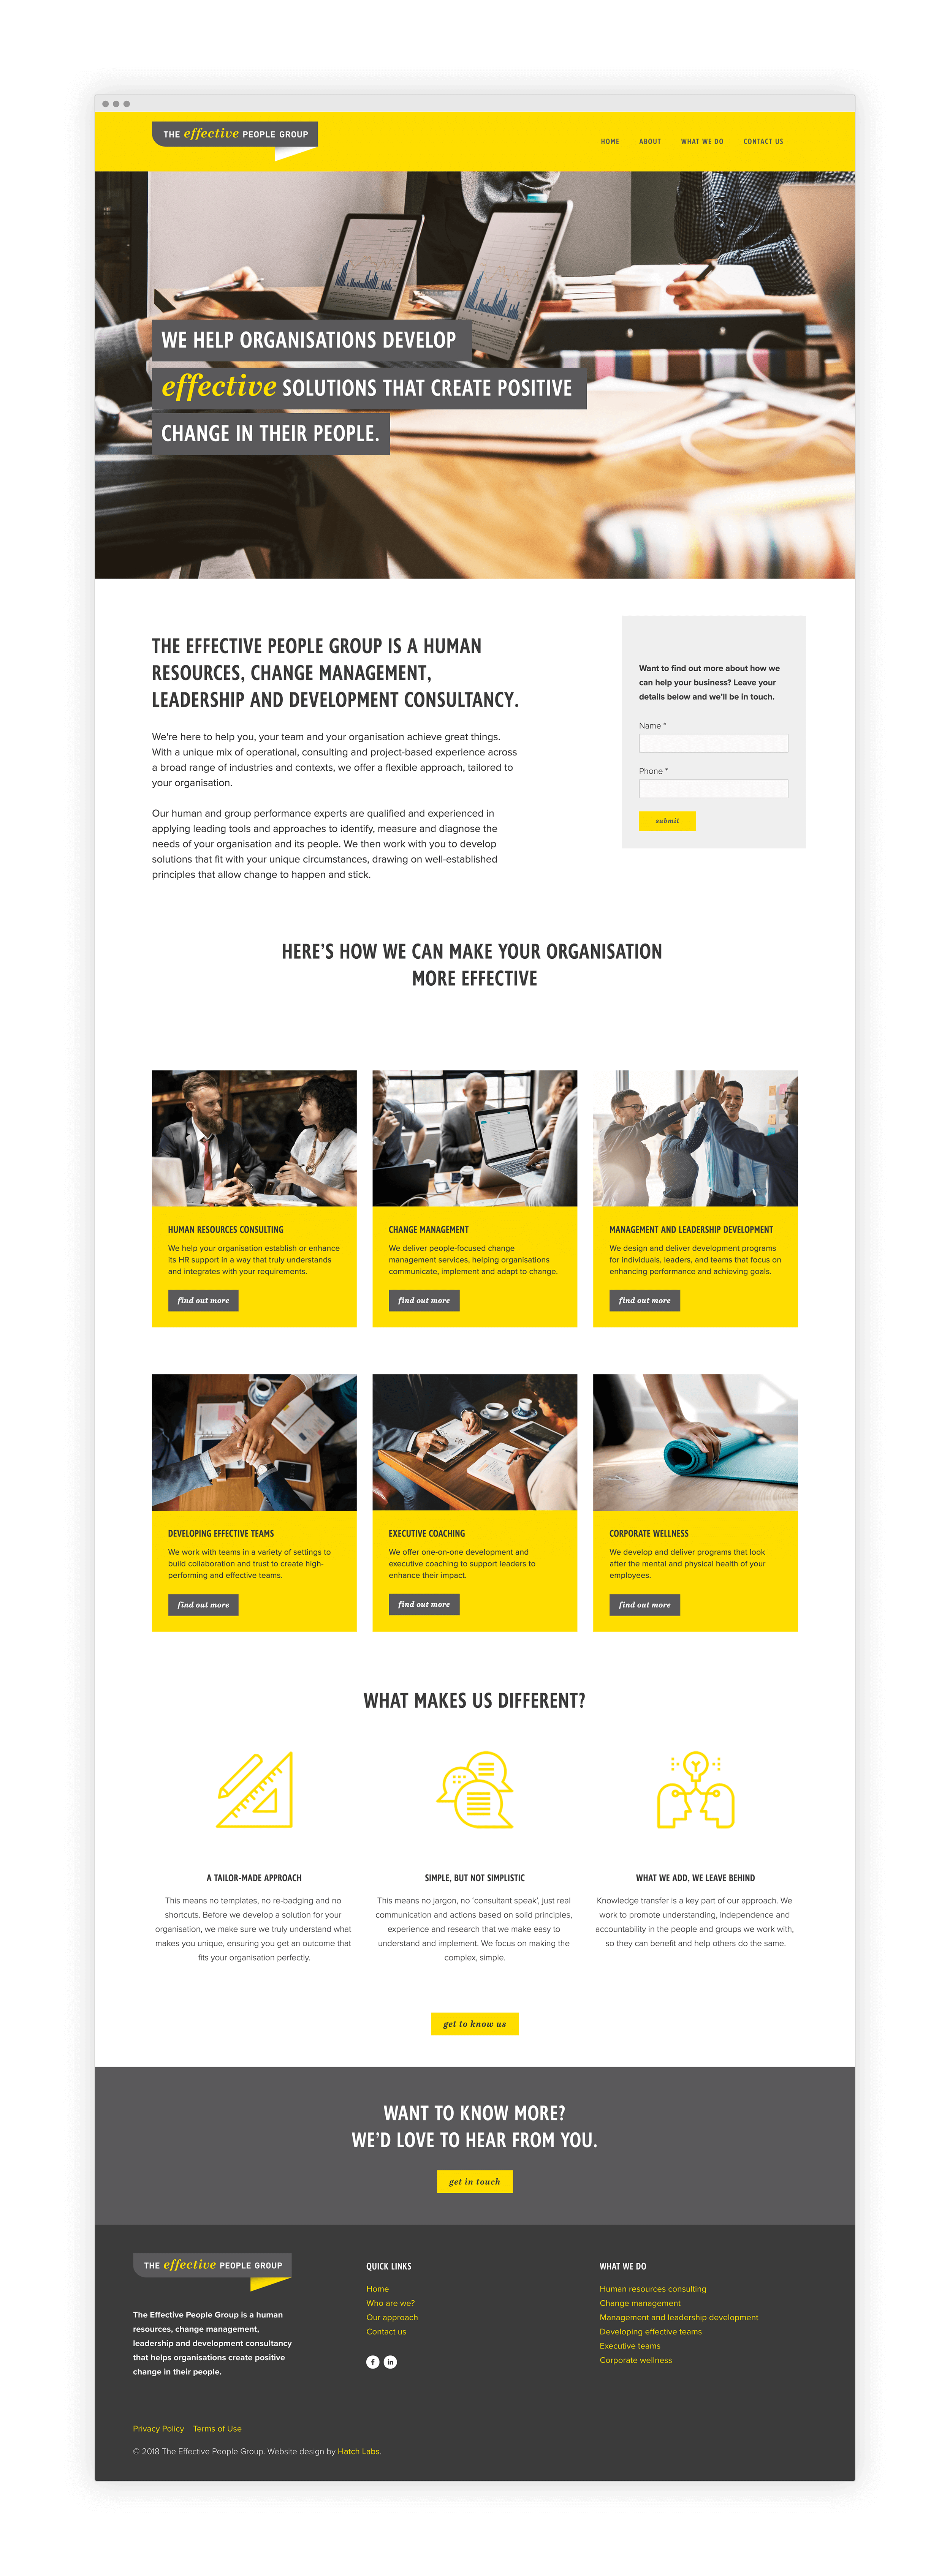 Effective-People-Group-Desktop.png